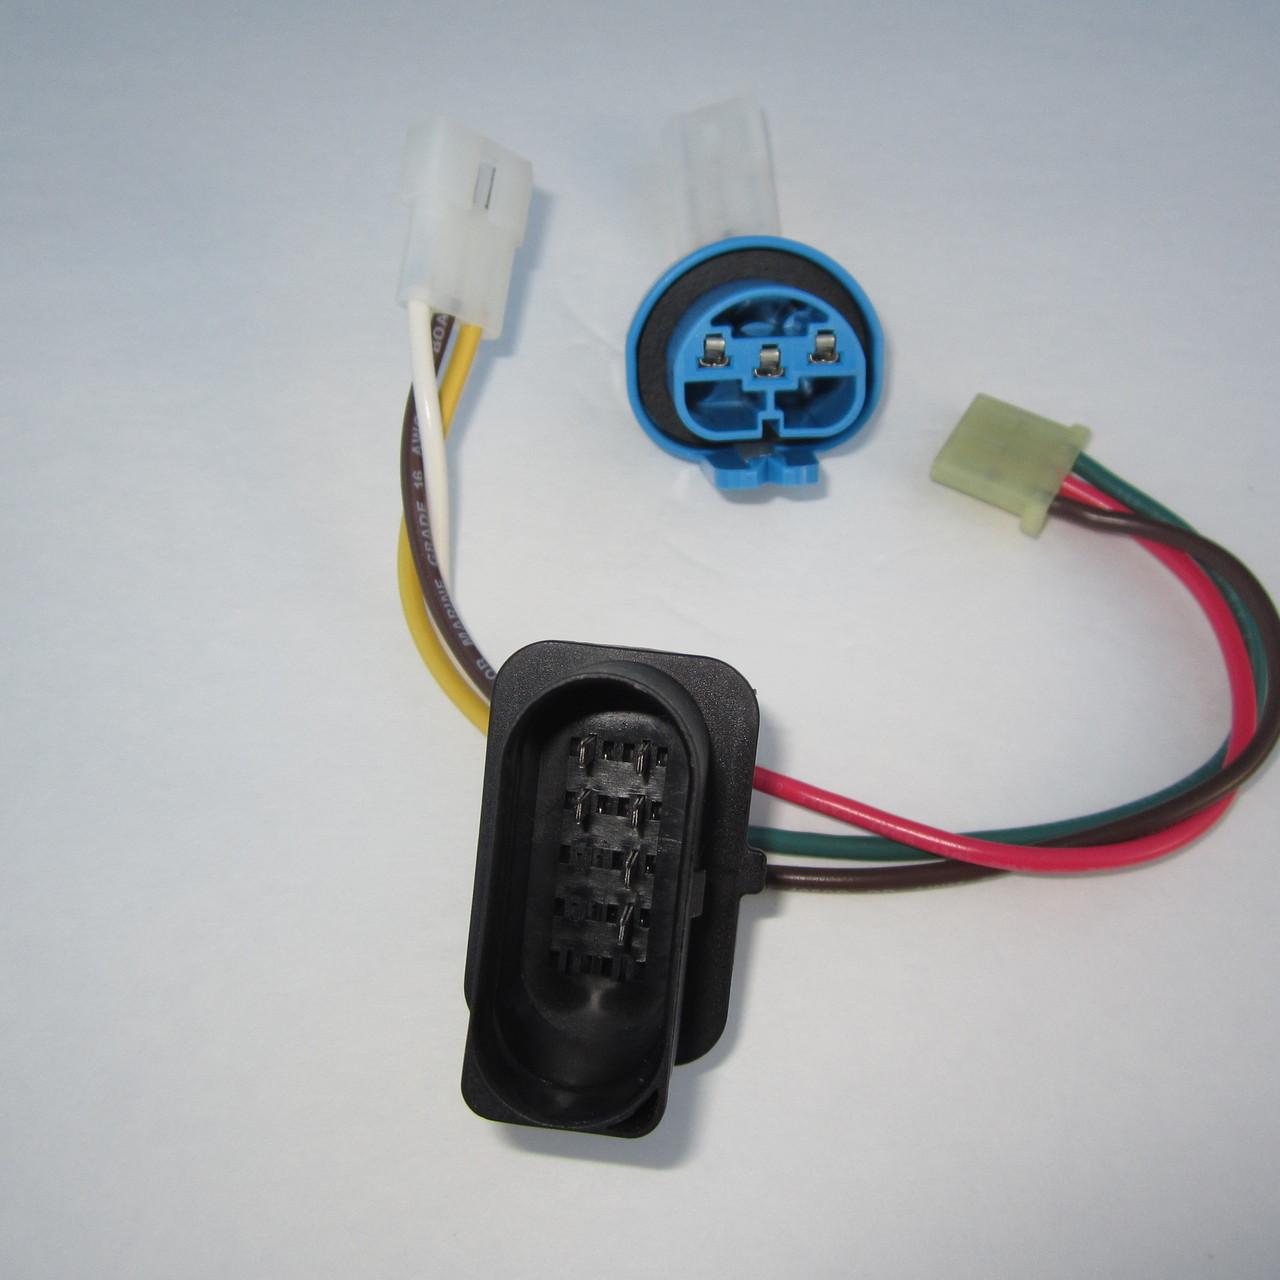 brand new complete 9004 9007 headlight wiring harness for mkiv jetta [ 1280 x 1280 Pixel ]